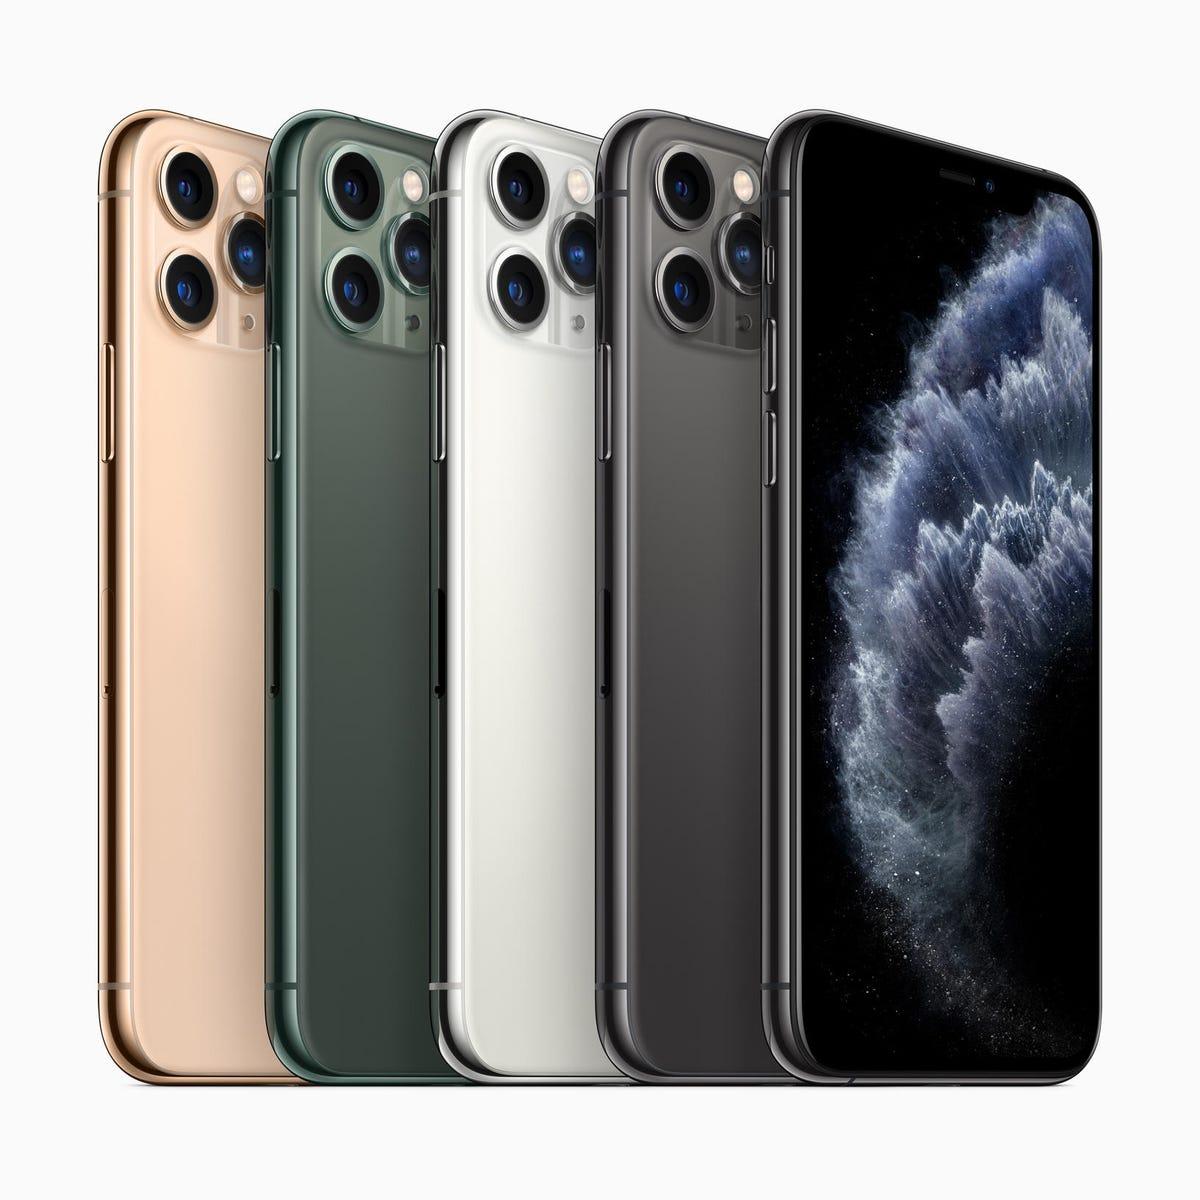 apple-iphone-11-pro-colors-091019.jpg